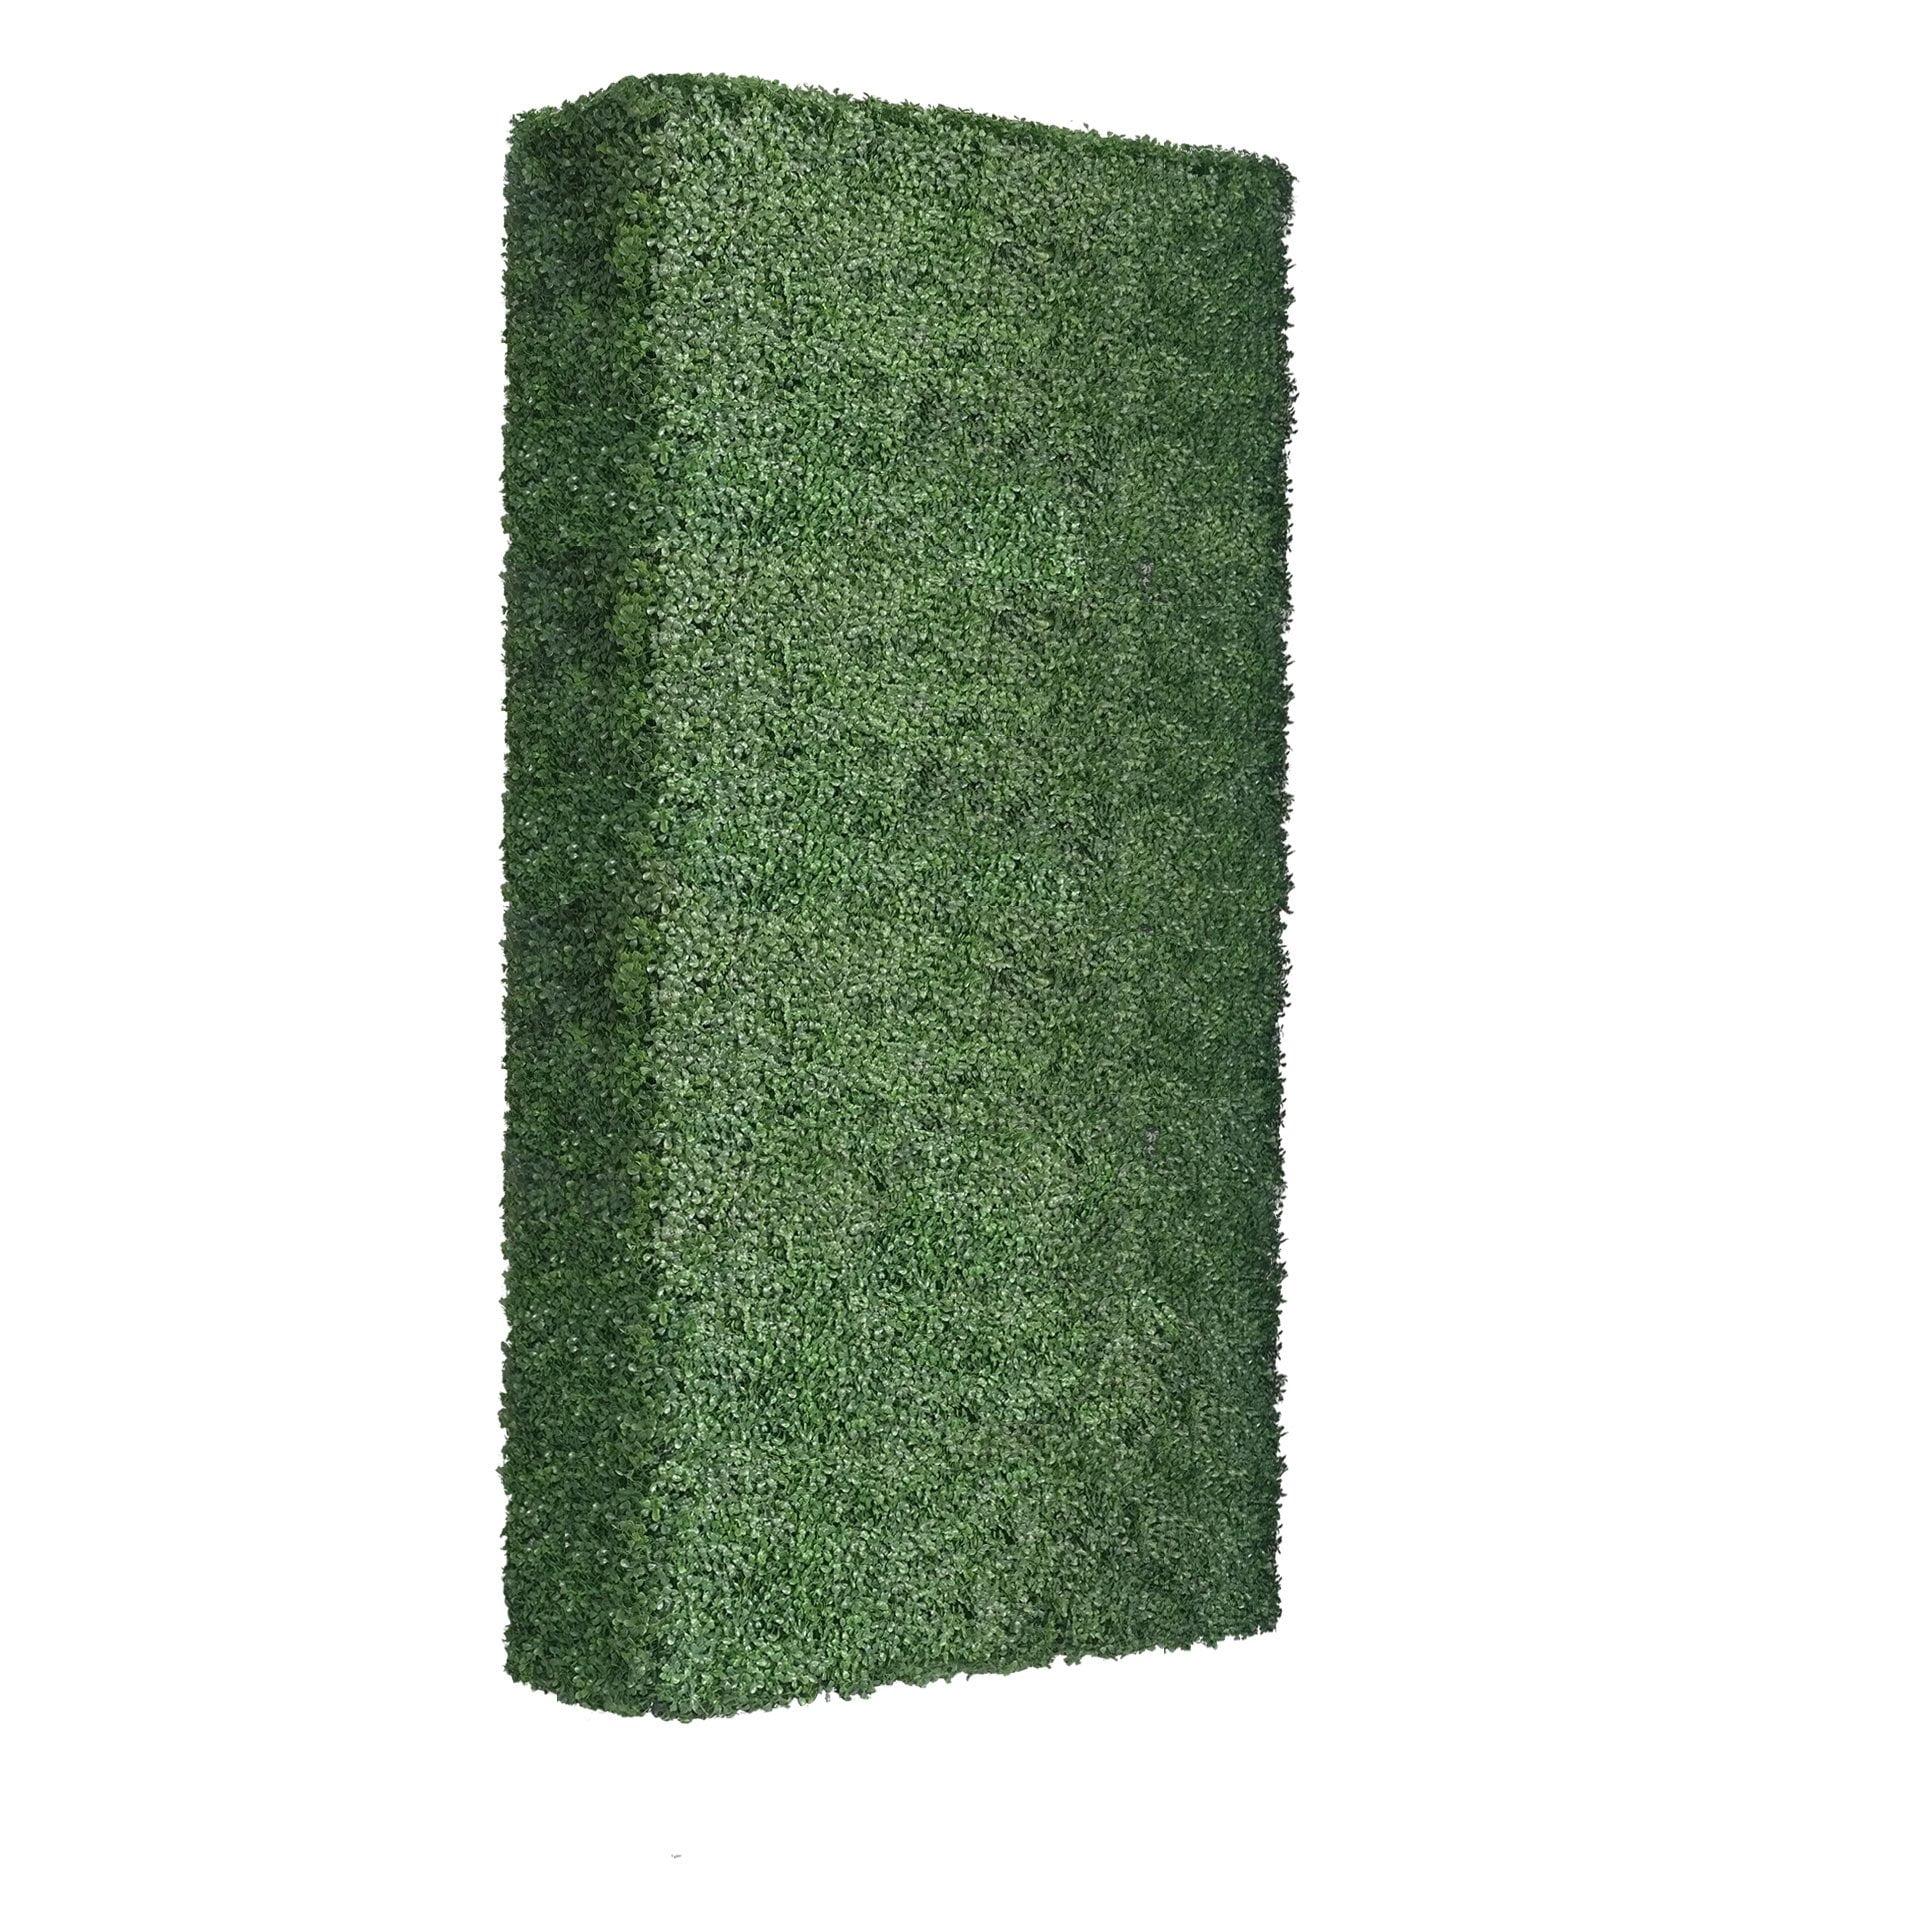 boxwood hedge 90 inches